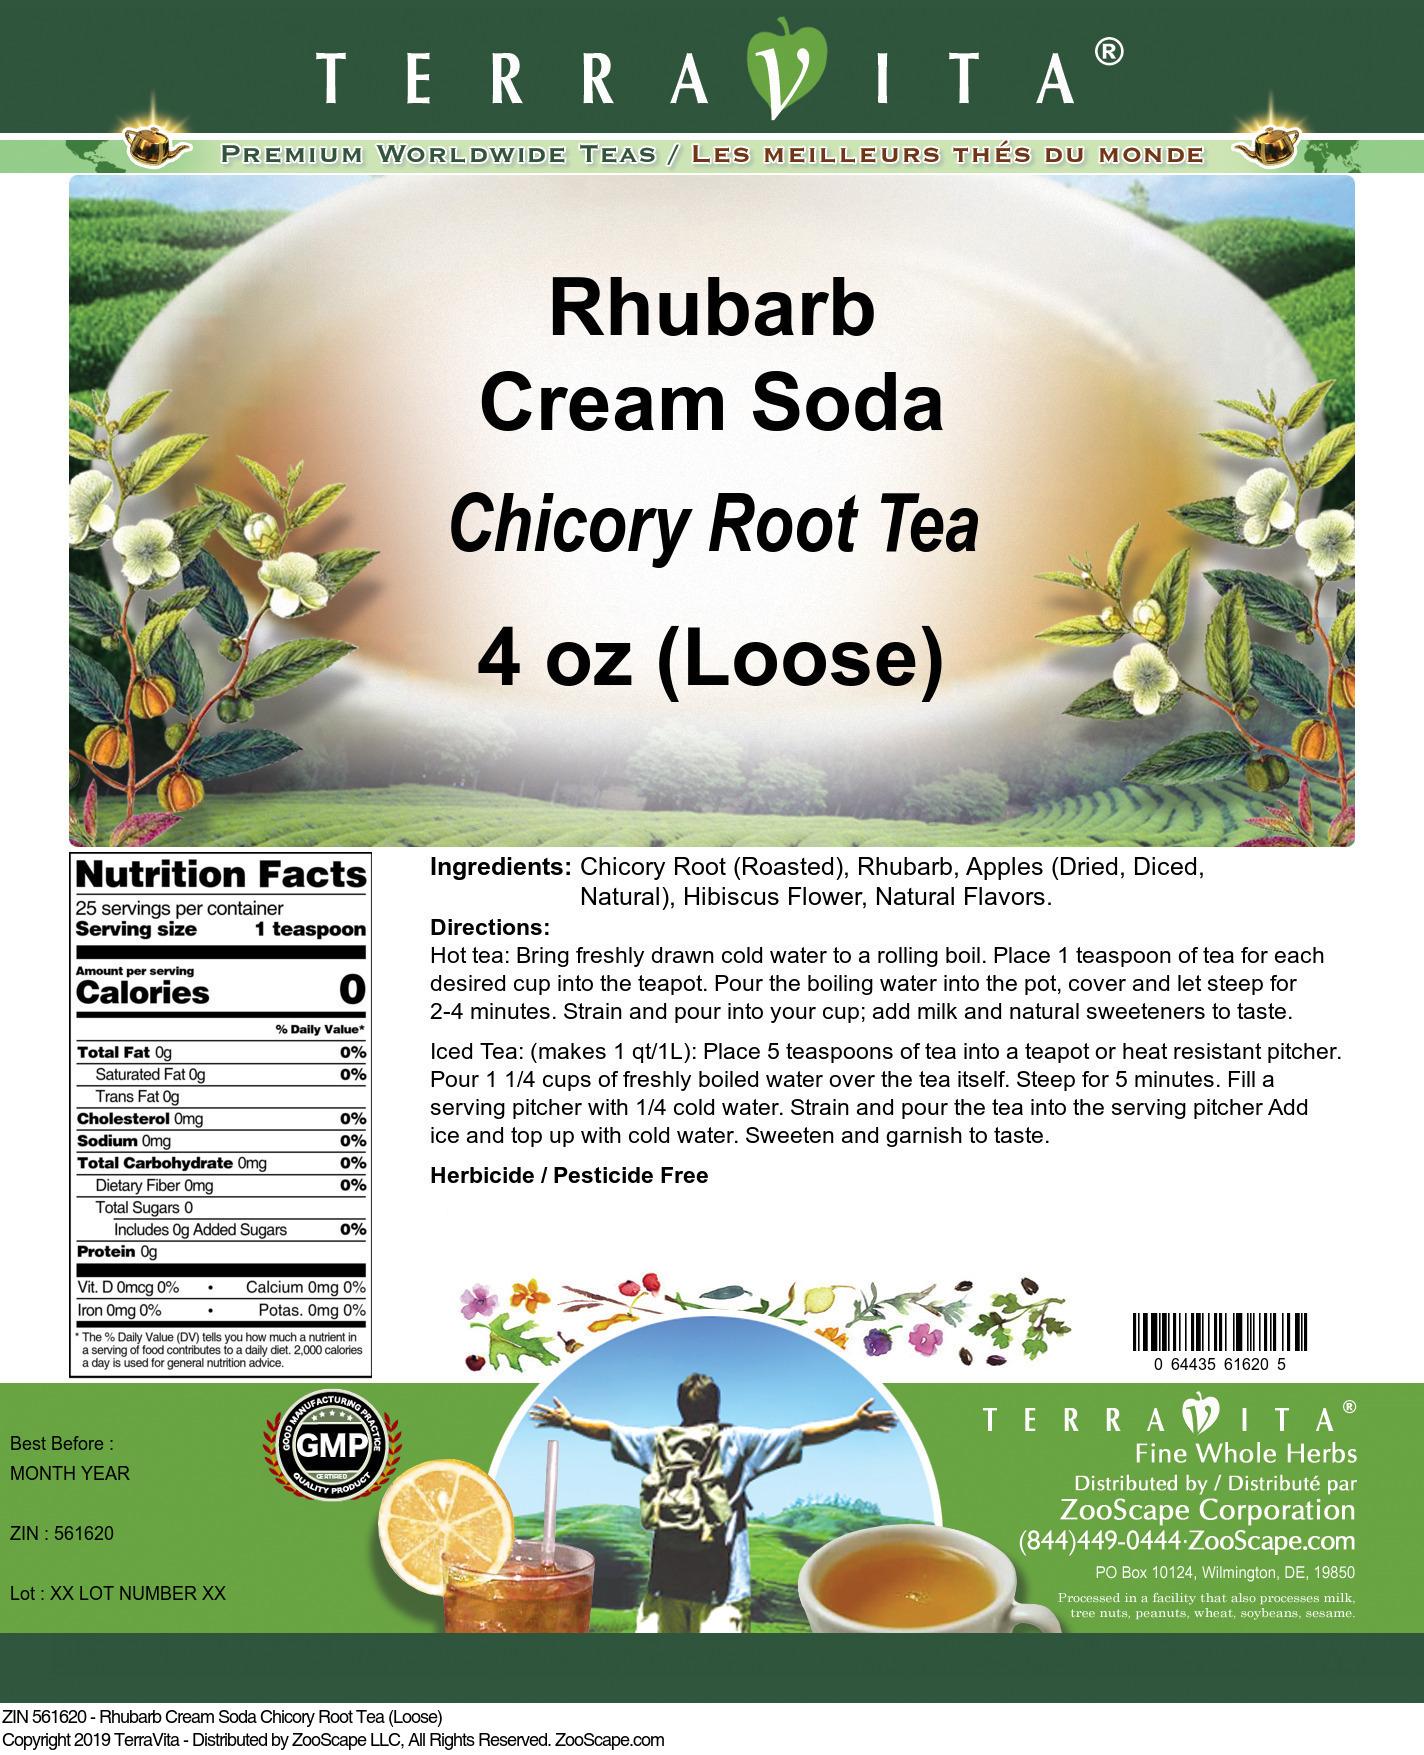 Rhubarb Cream Soda Chicory Root Tea (Loose)